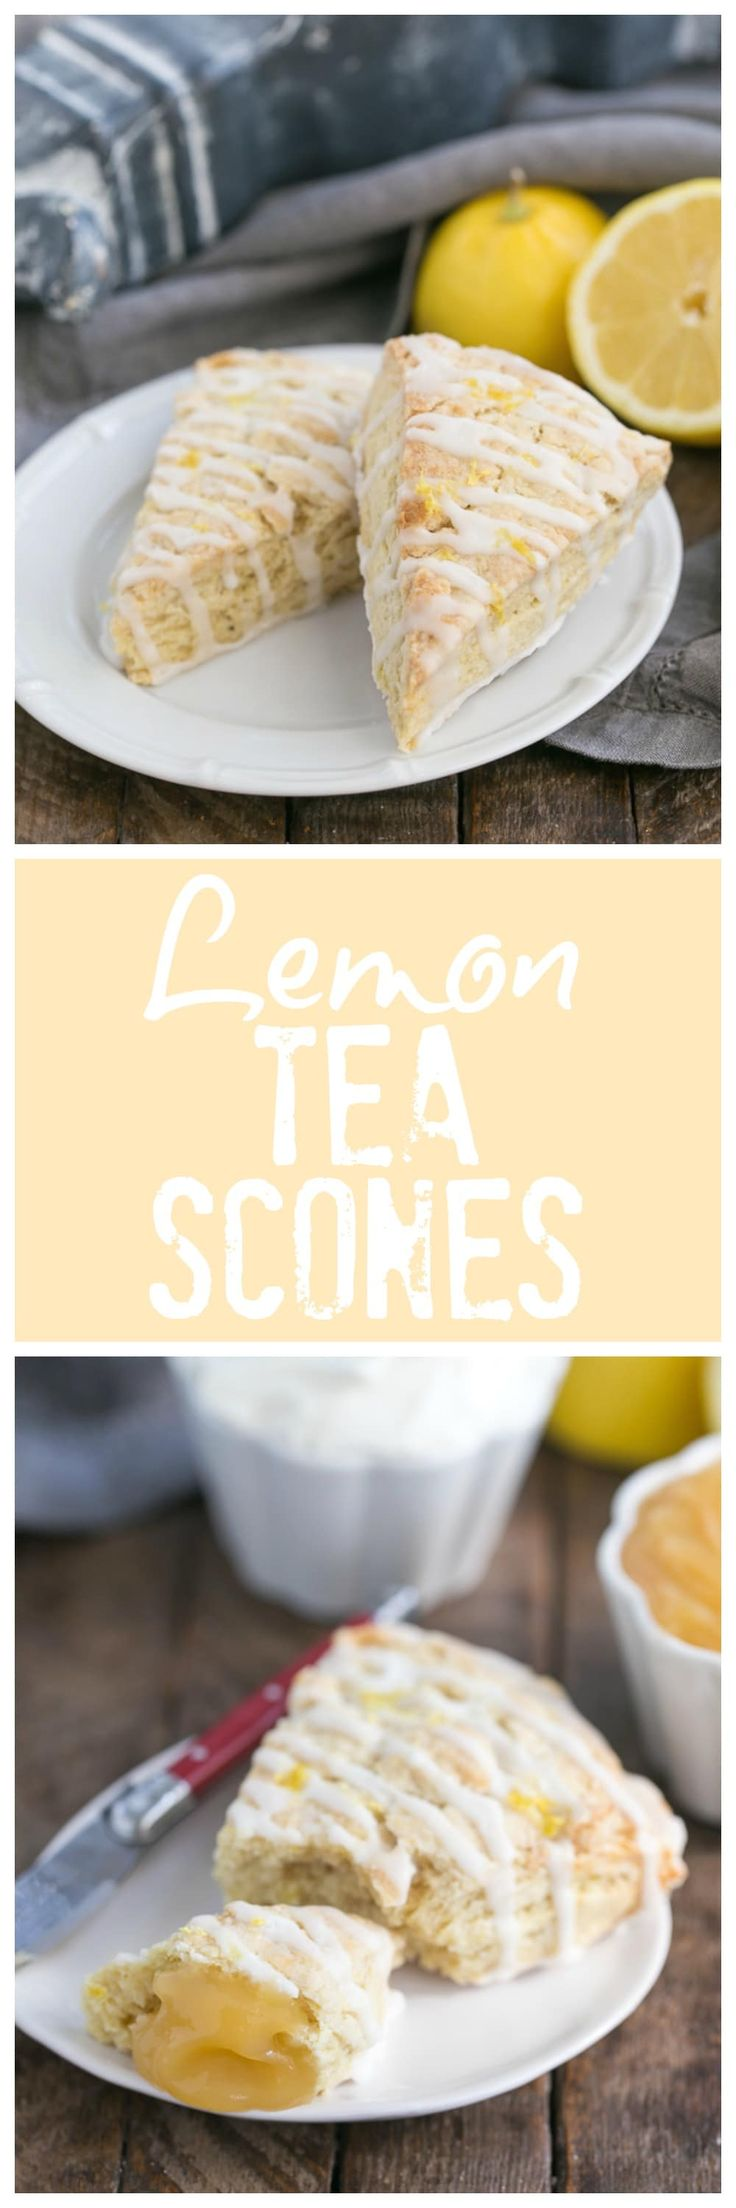 Glazed Lemon Tea Scones | A citrus infused scone enhanced by English breakfast tea @lizzydo